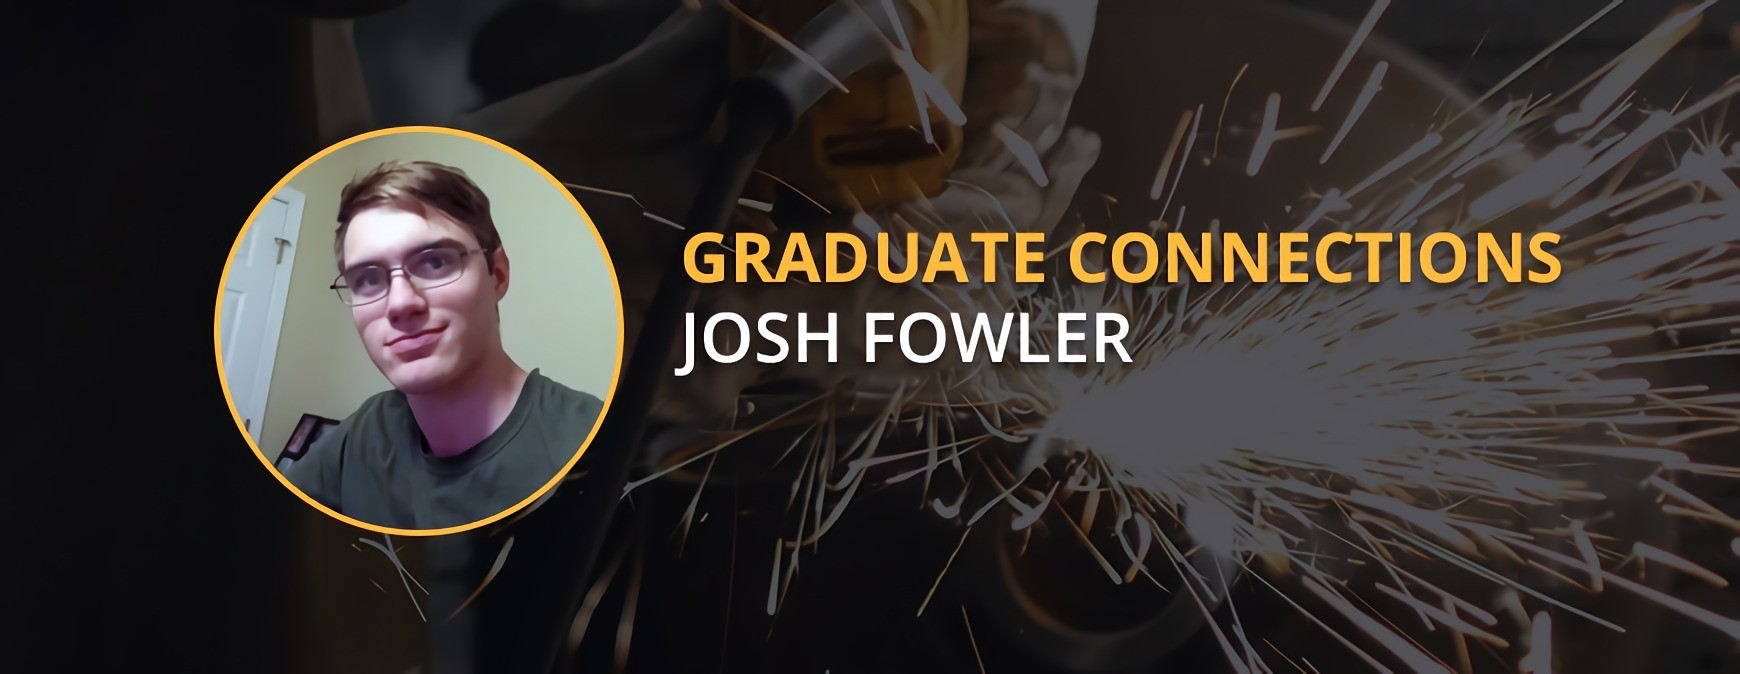 Josh Fowler Graduate Connection